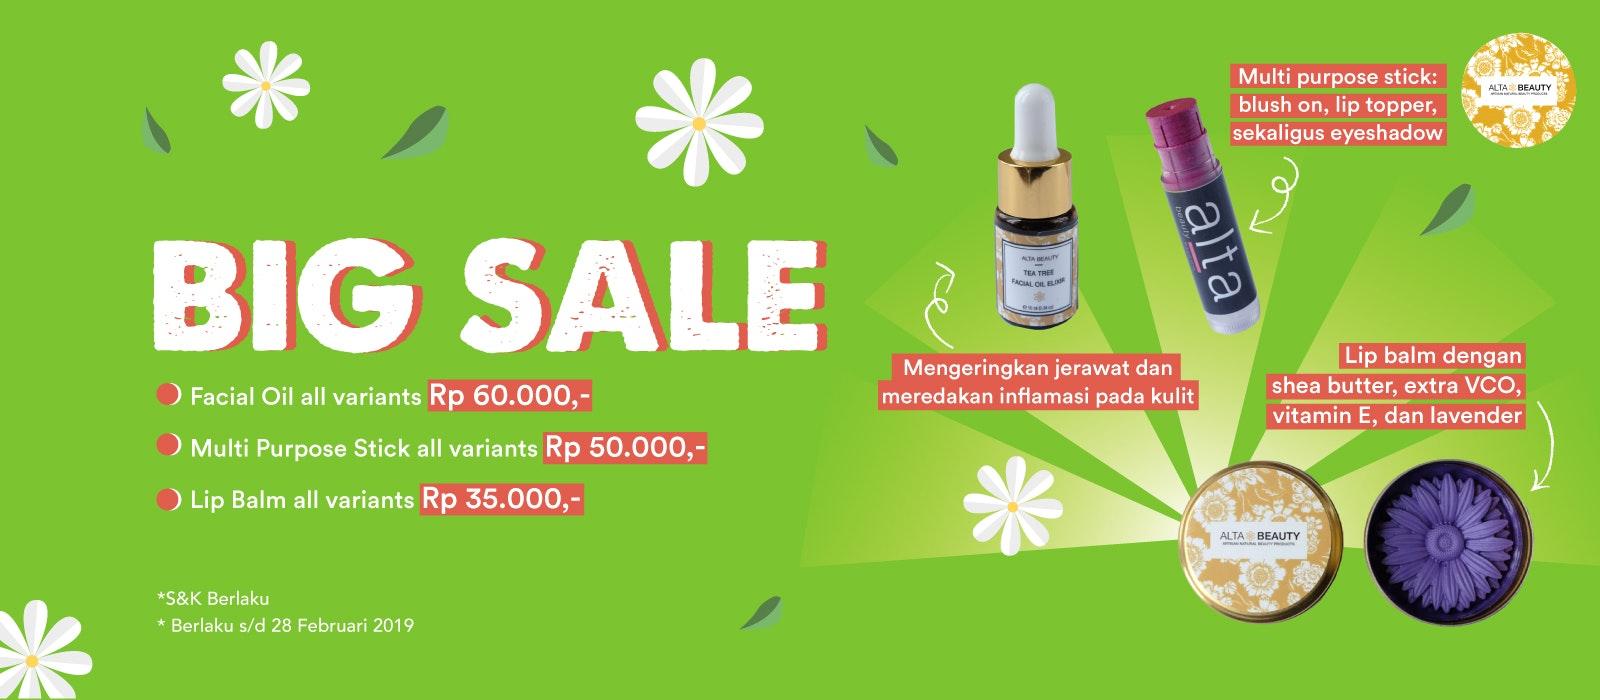 Alta Beauty Big Sale